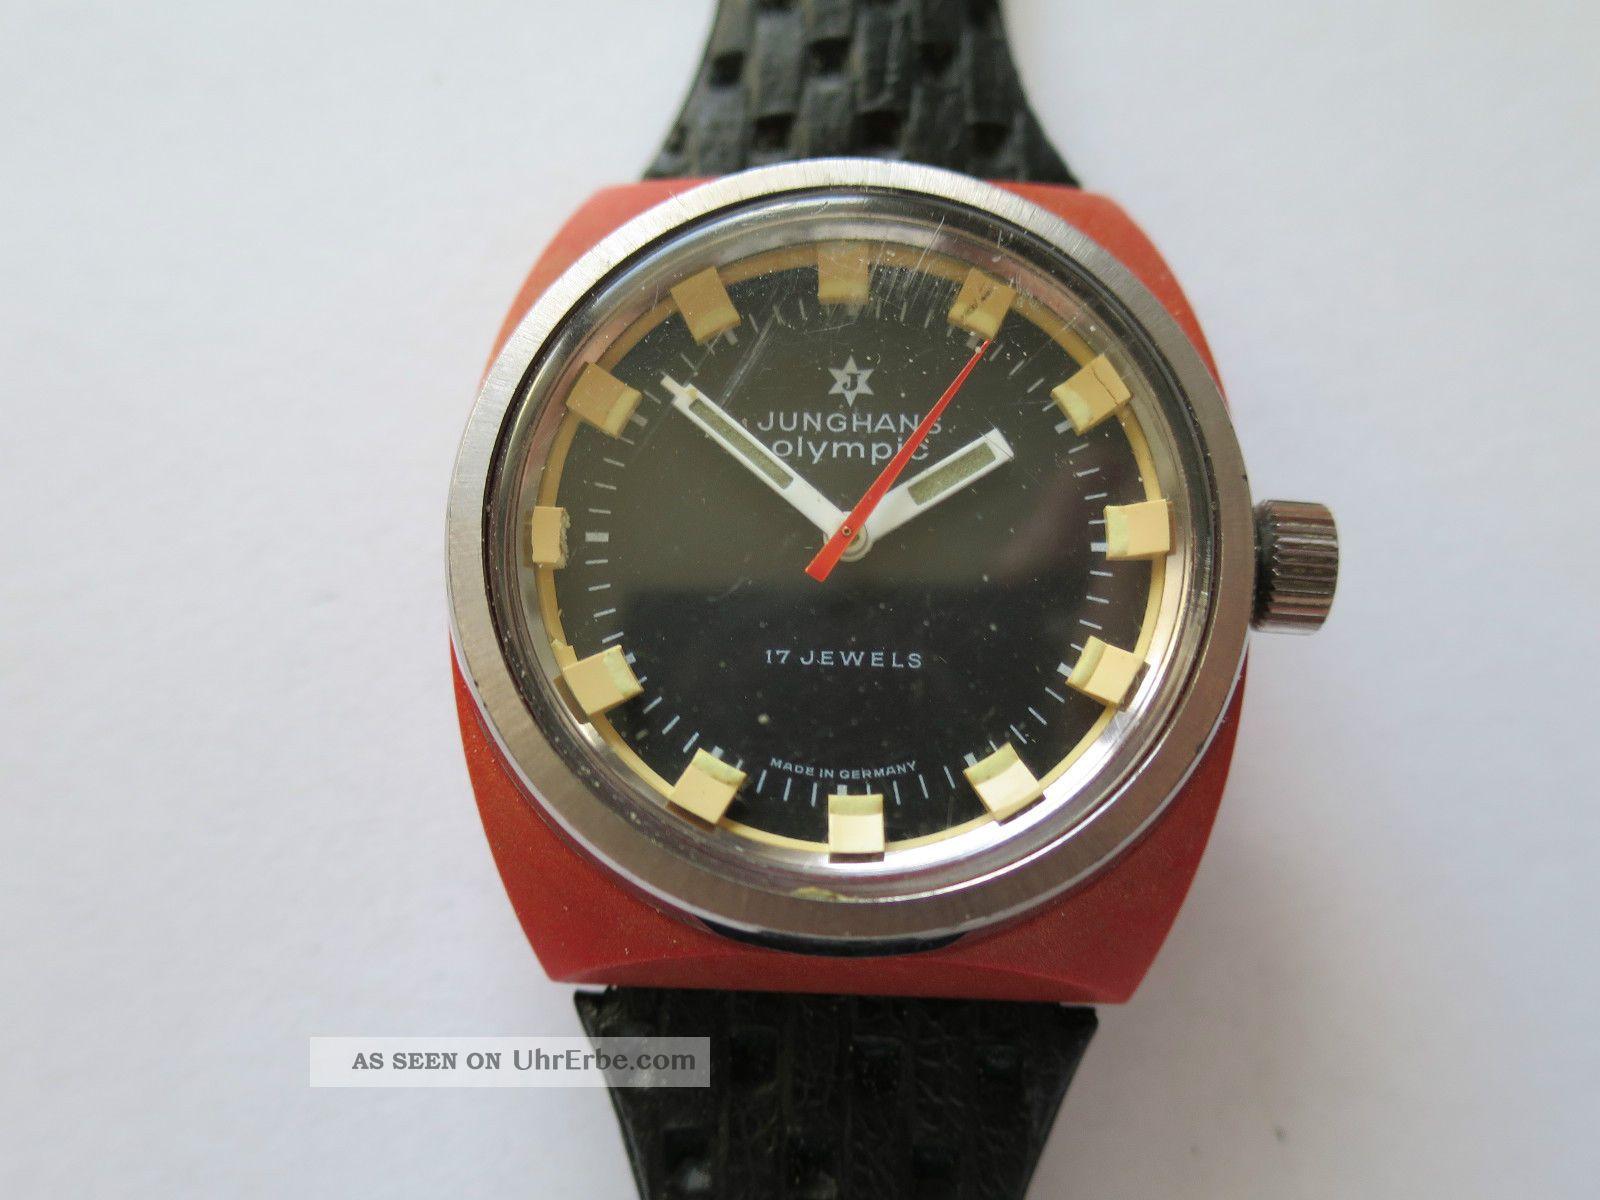 Junghans Olympic Handaufzug Armbanduhren Bild